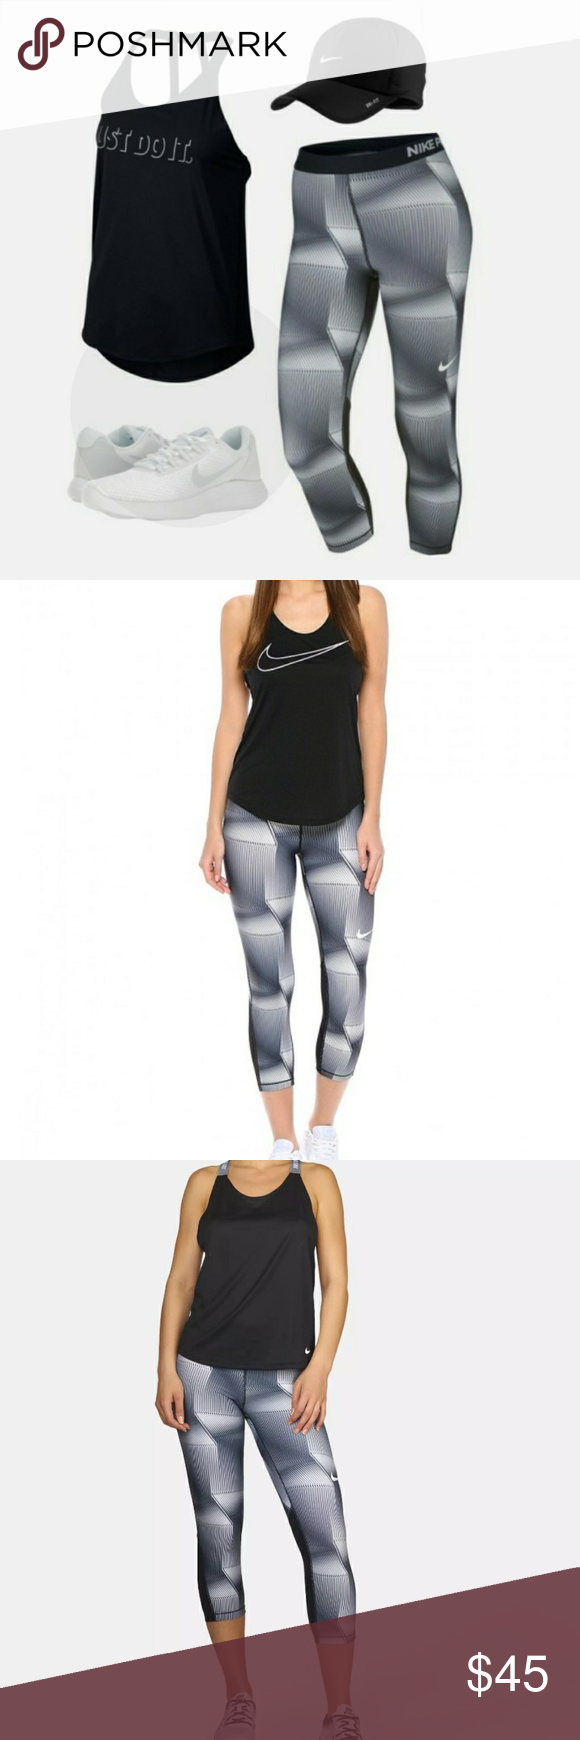 052d6c12f4075d Spotted while shopping on Poshmark: New Nike Capris! #poshmark #fashion # shopping #style #Nike #Pants